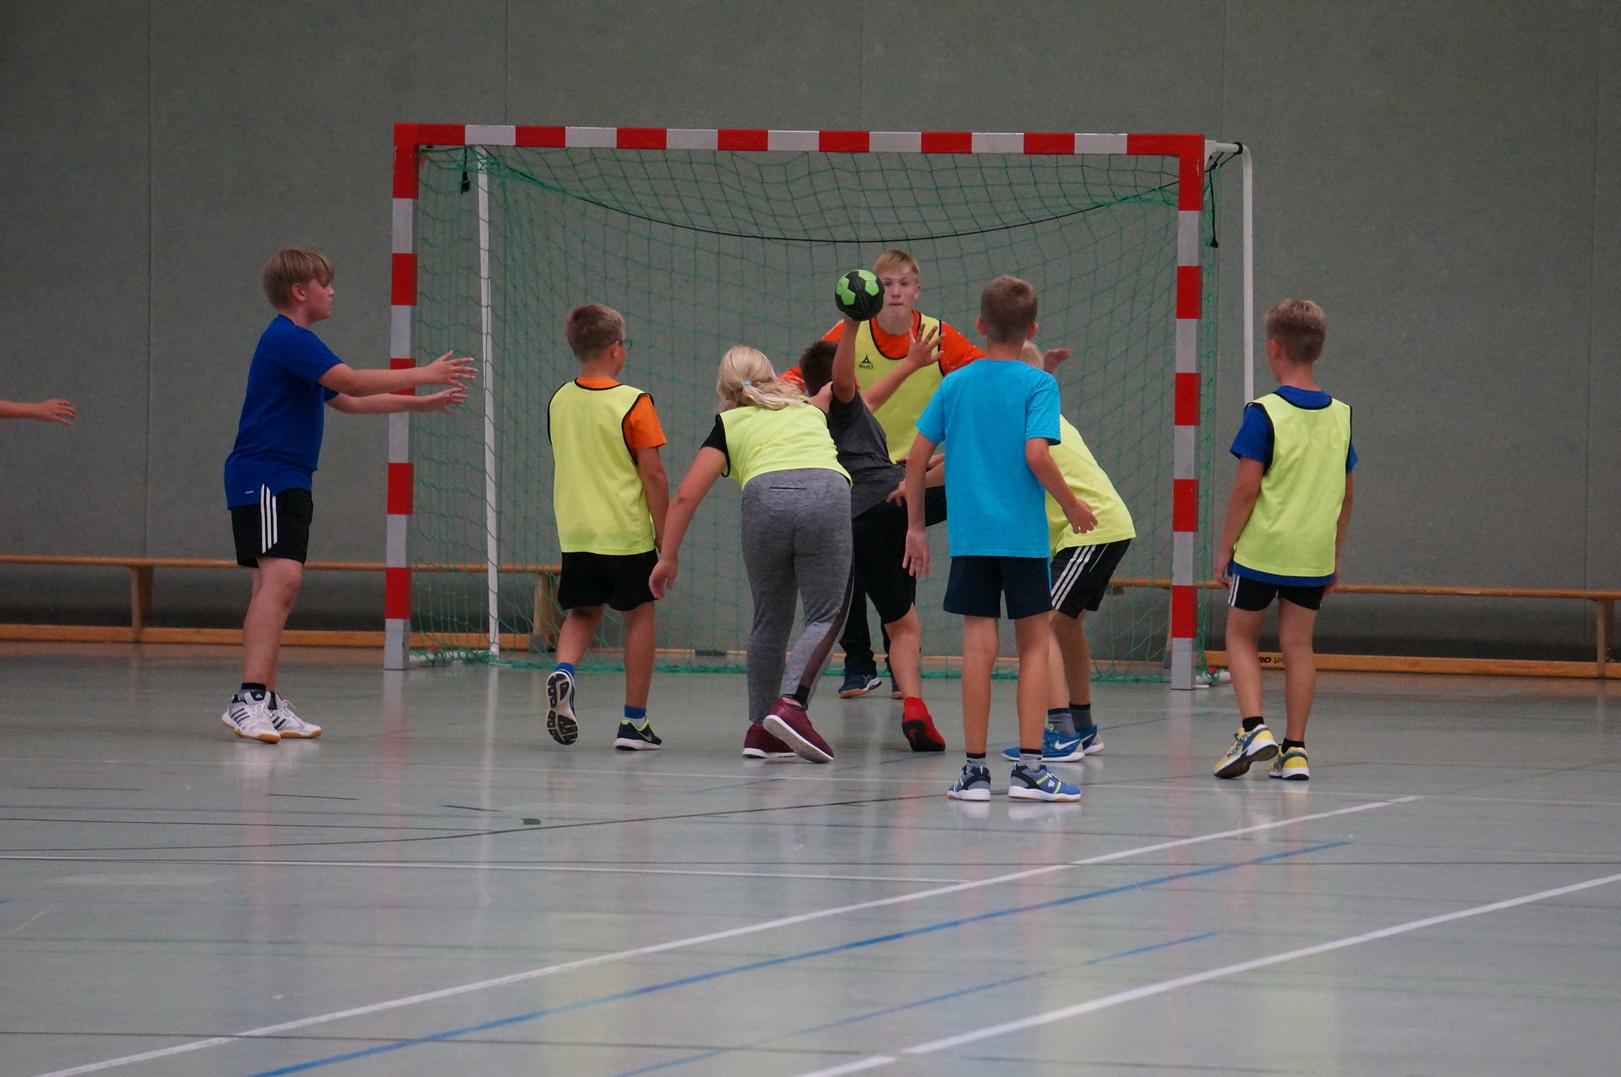 201808_Handballcamp_SDH_MG_125w